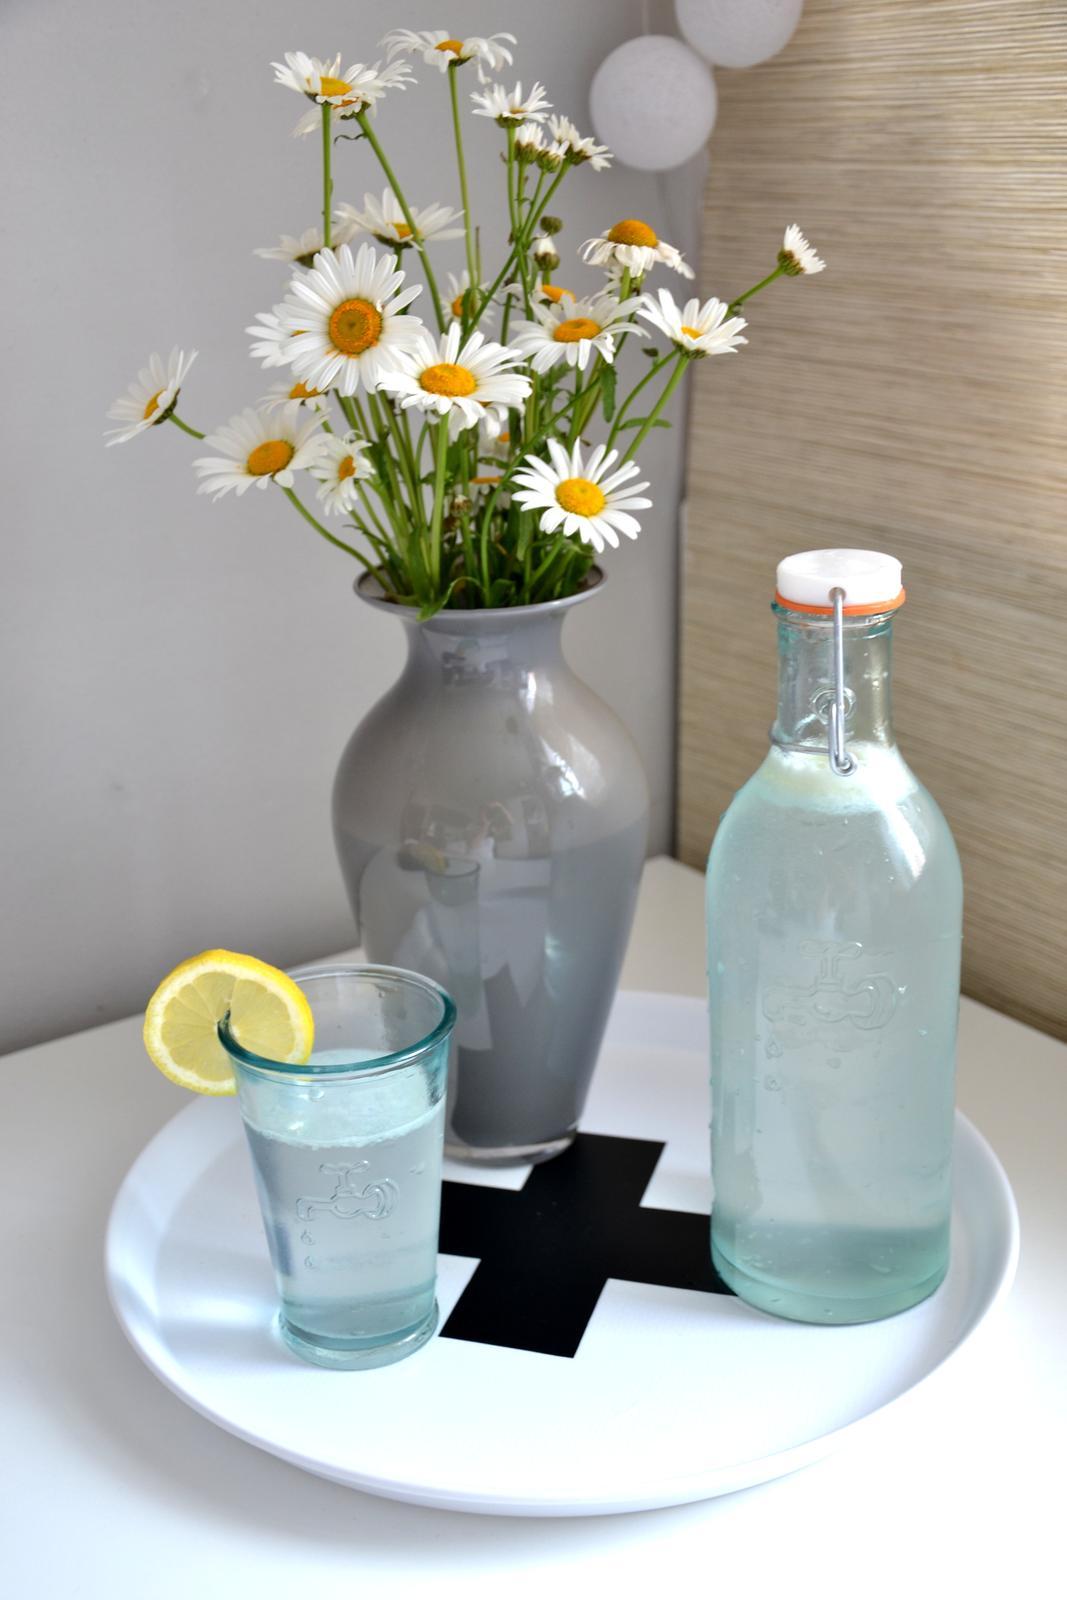 U nás doma - piju vodu s citrónem